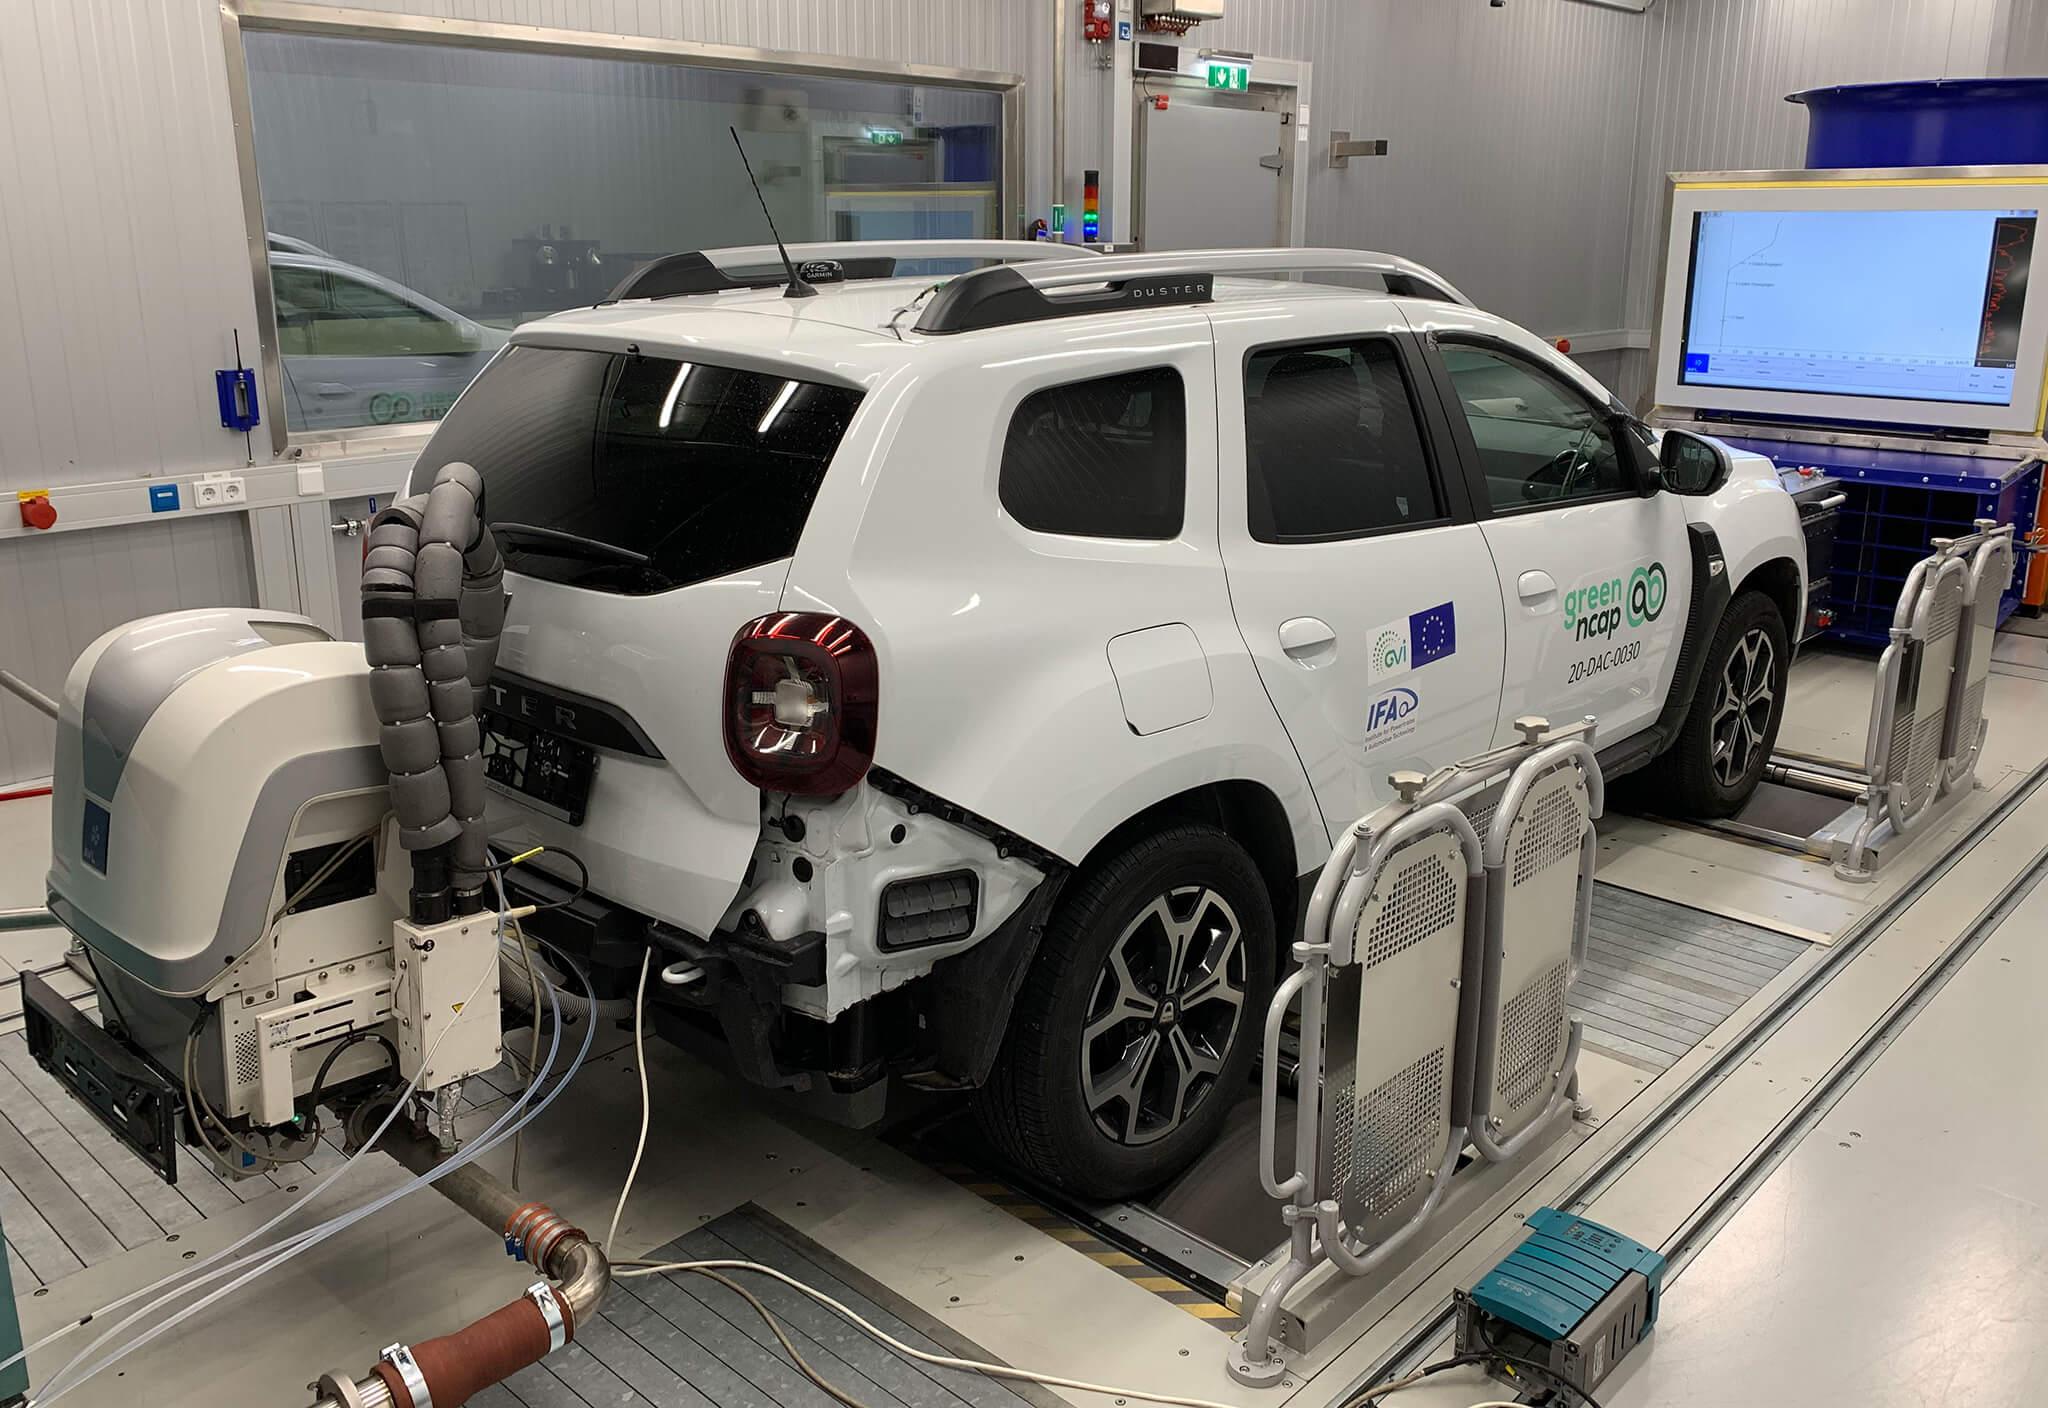 Dacia Duster Green NCAP